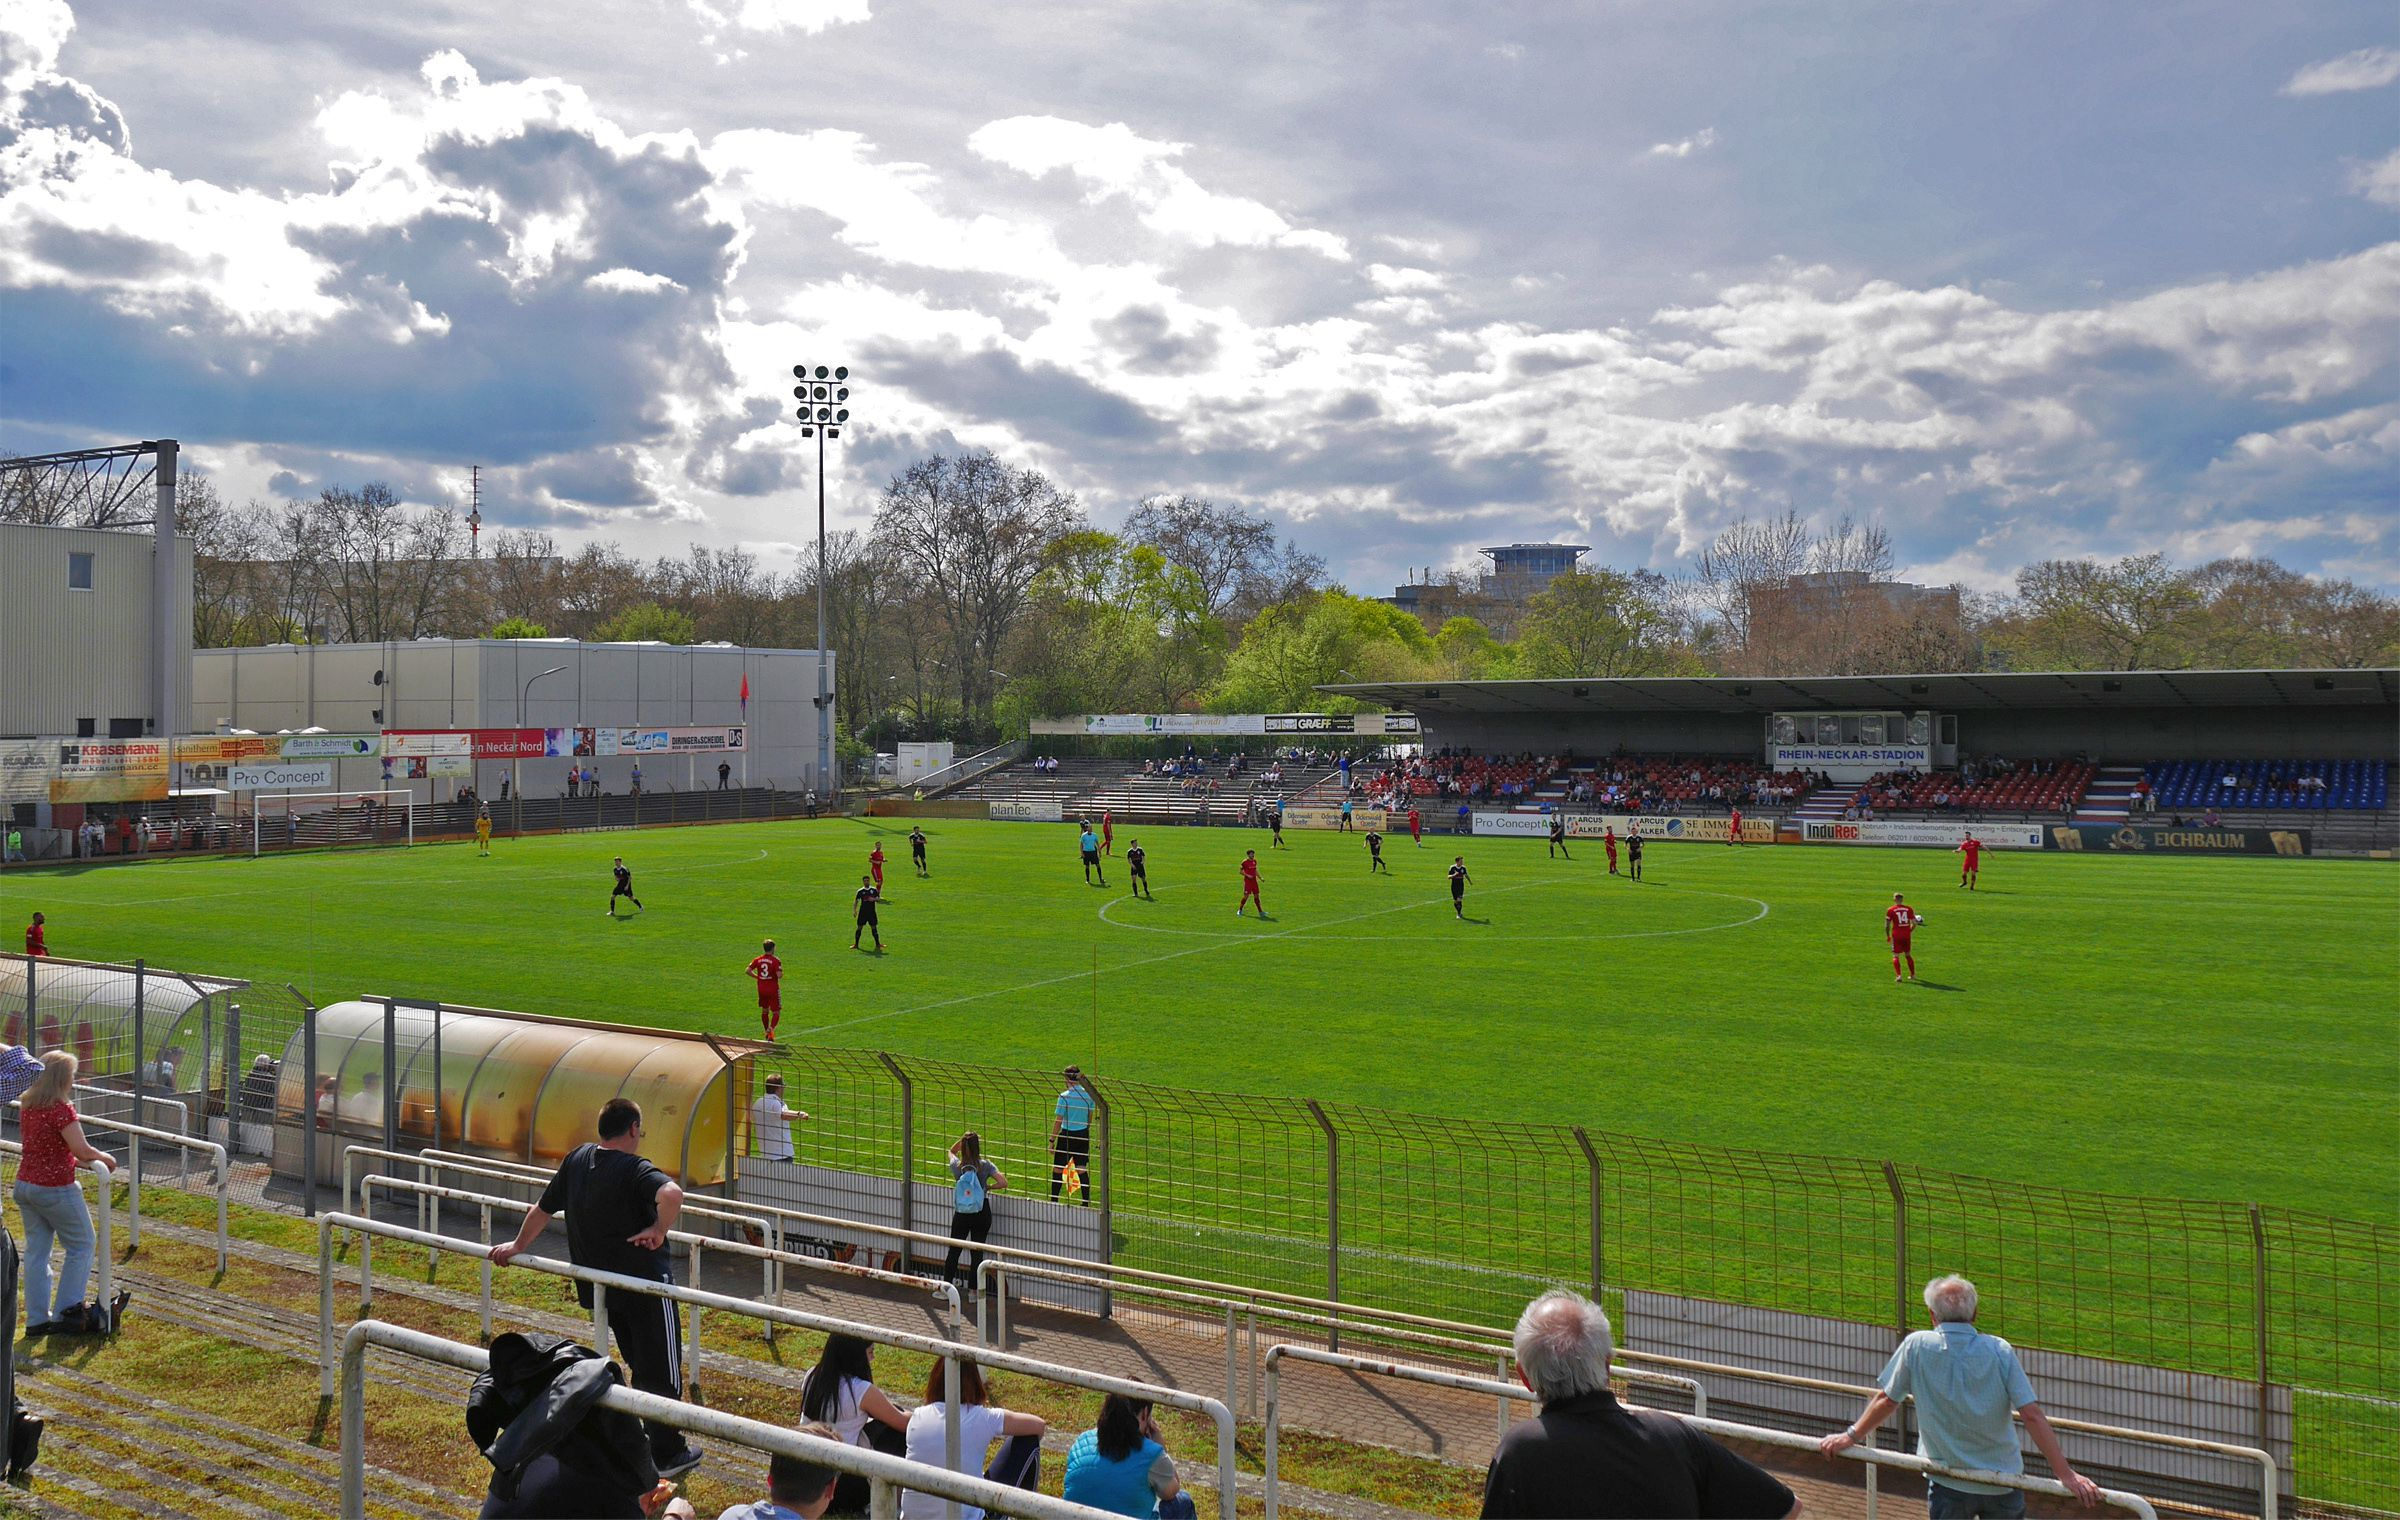 VfR Mannheim vs FC Germania Friedrichstal 0:2